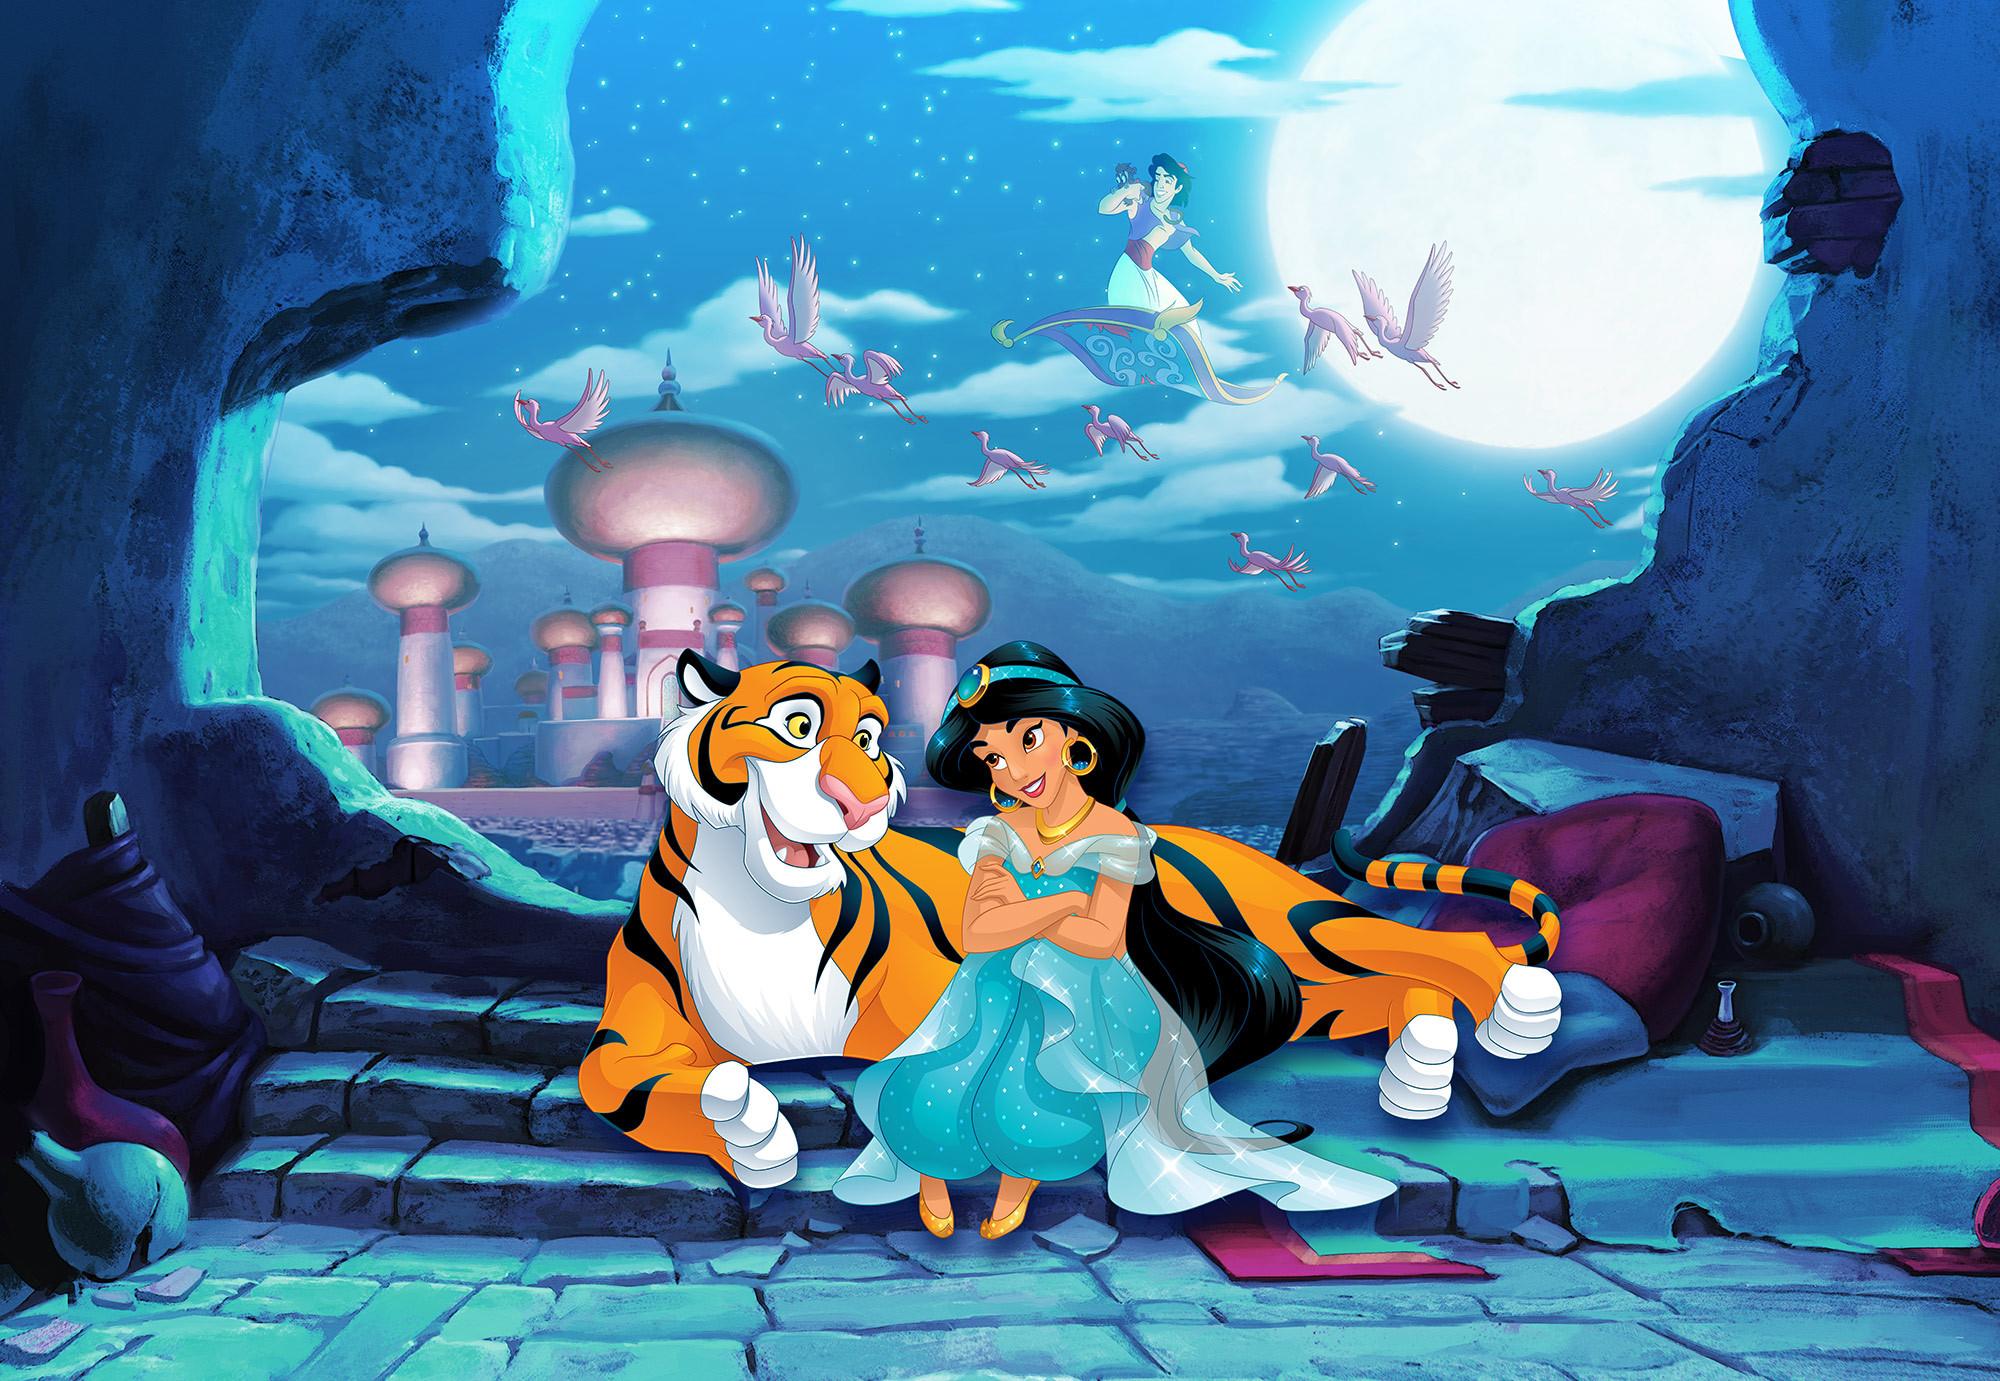 Waiting for Aladdin